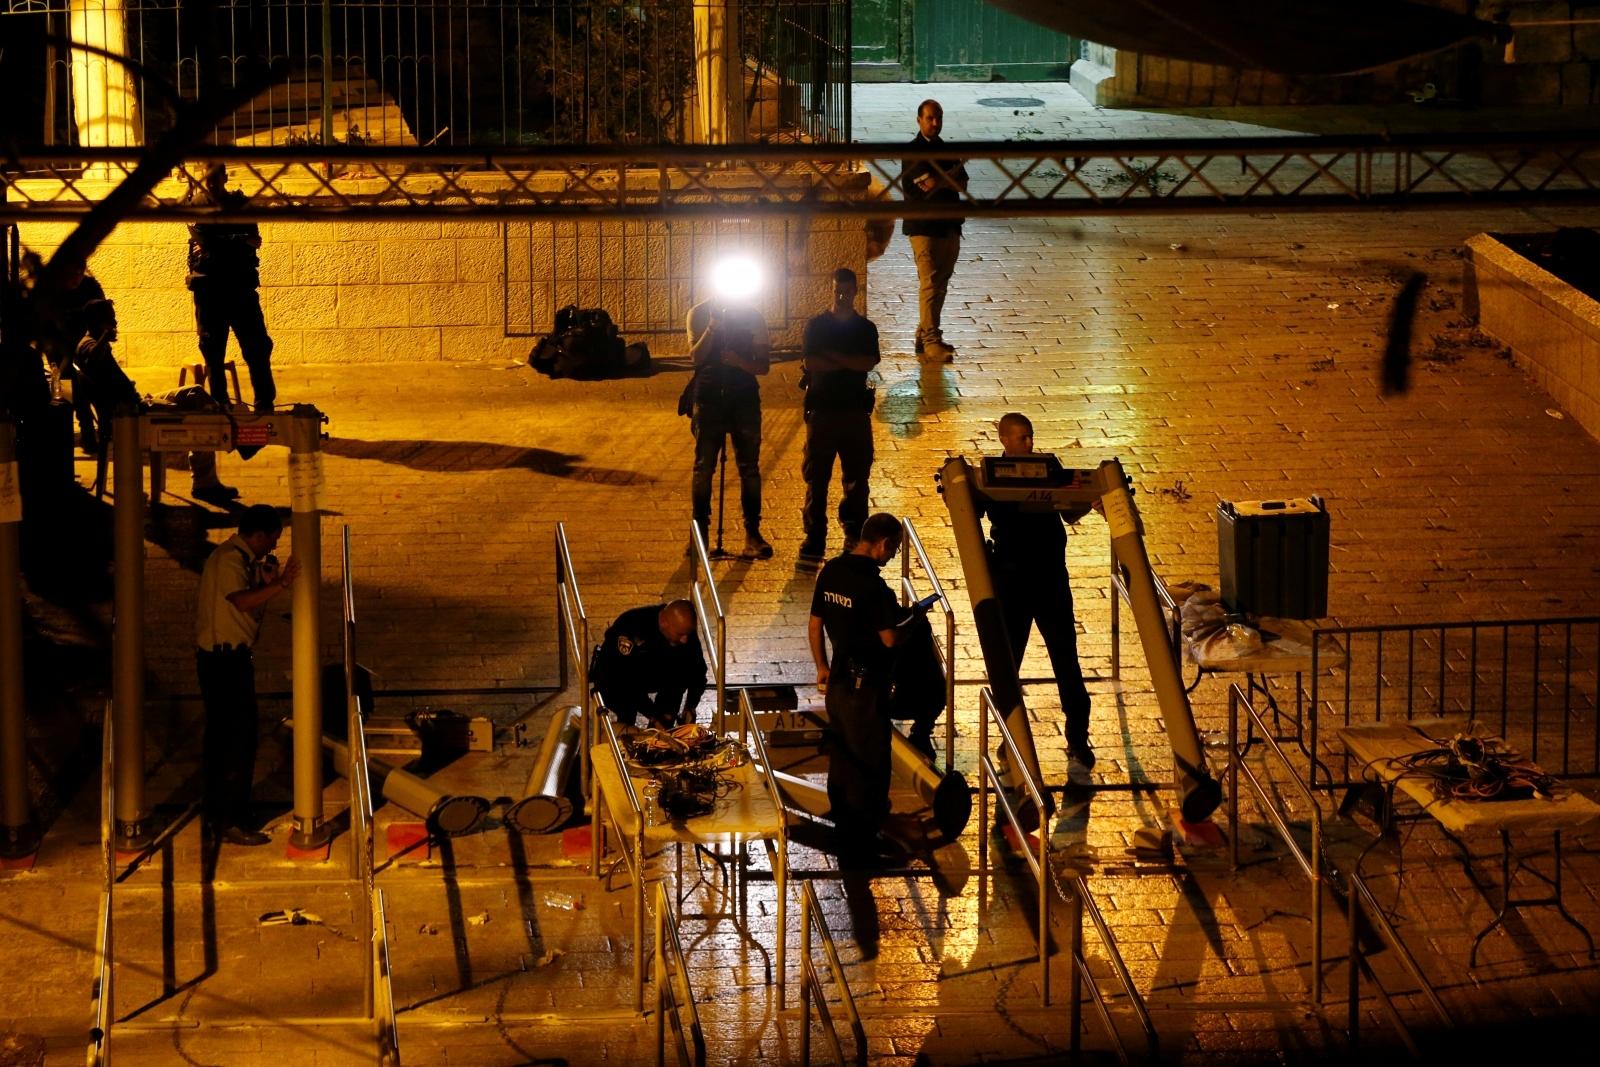 Israeli security forces remove metal detectors